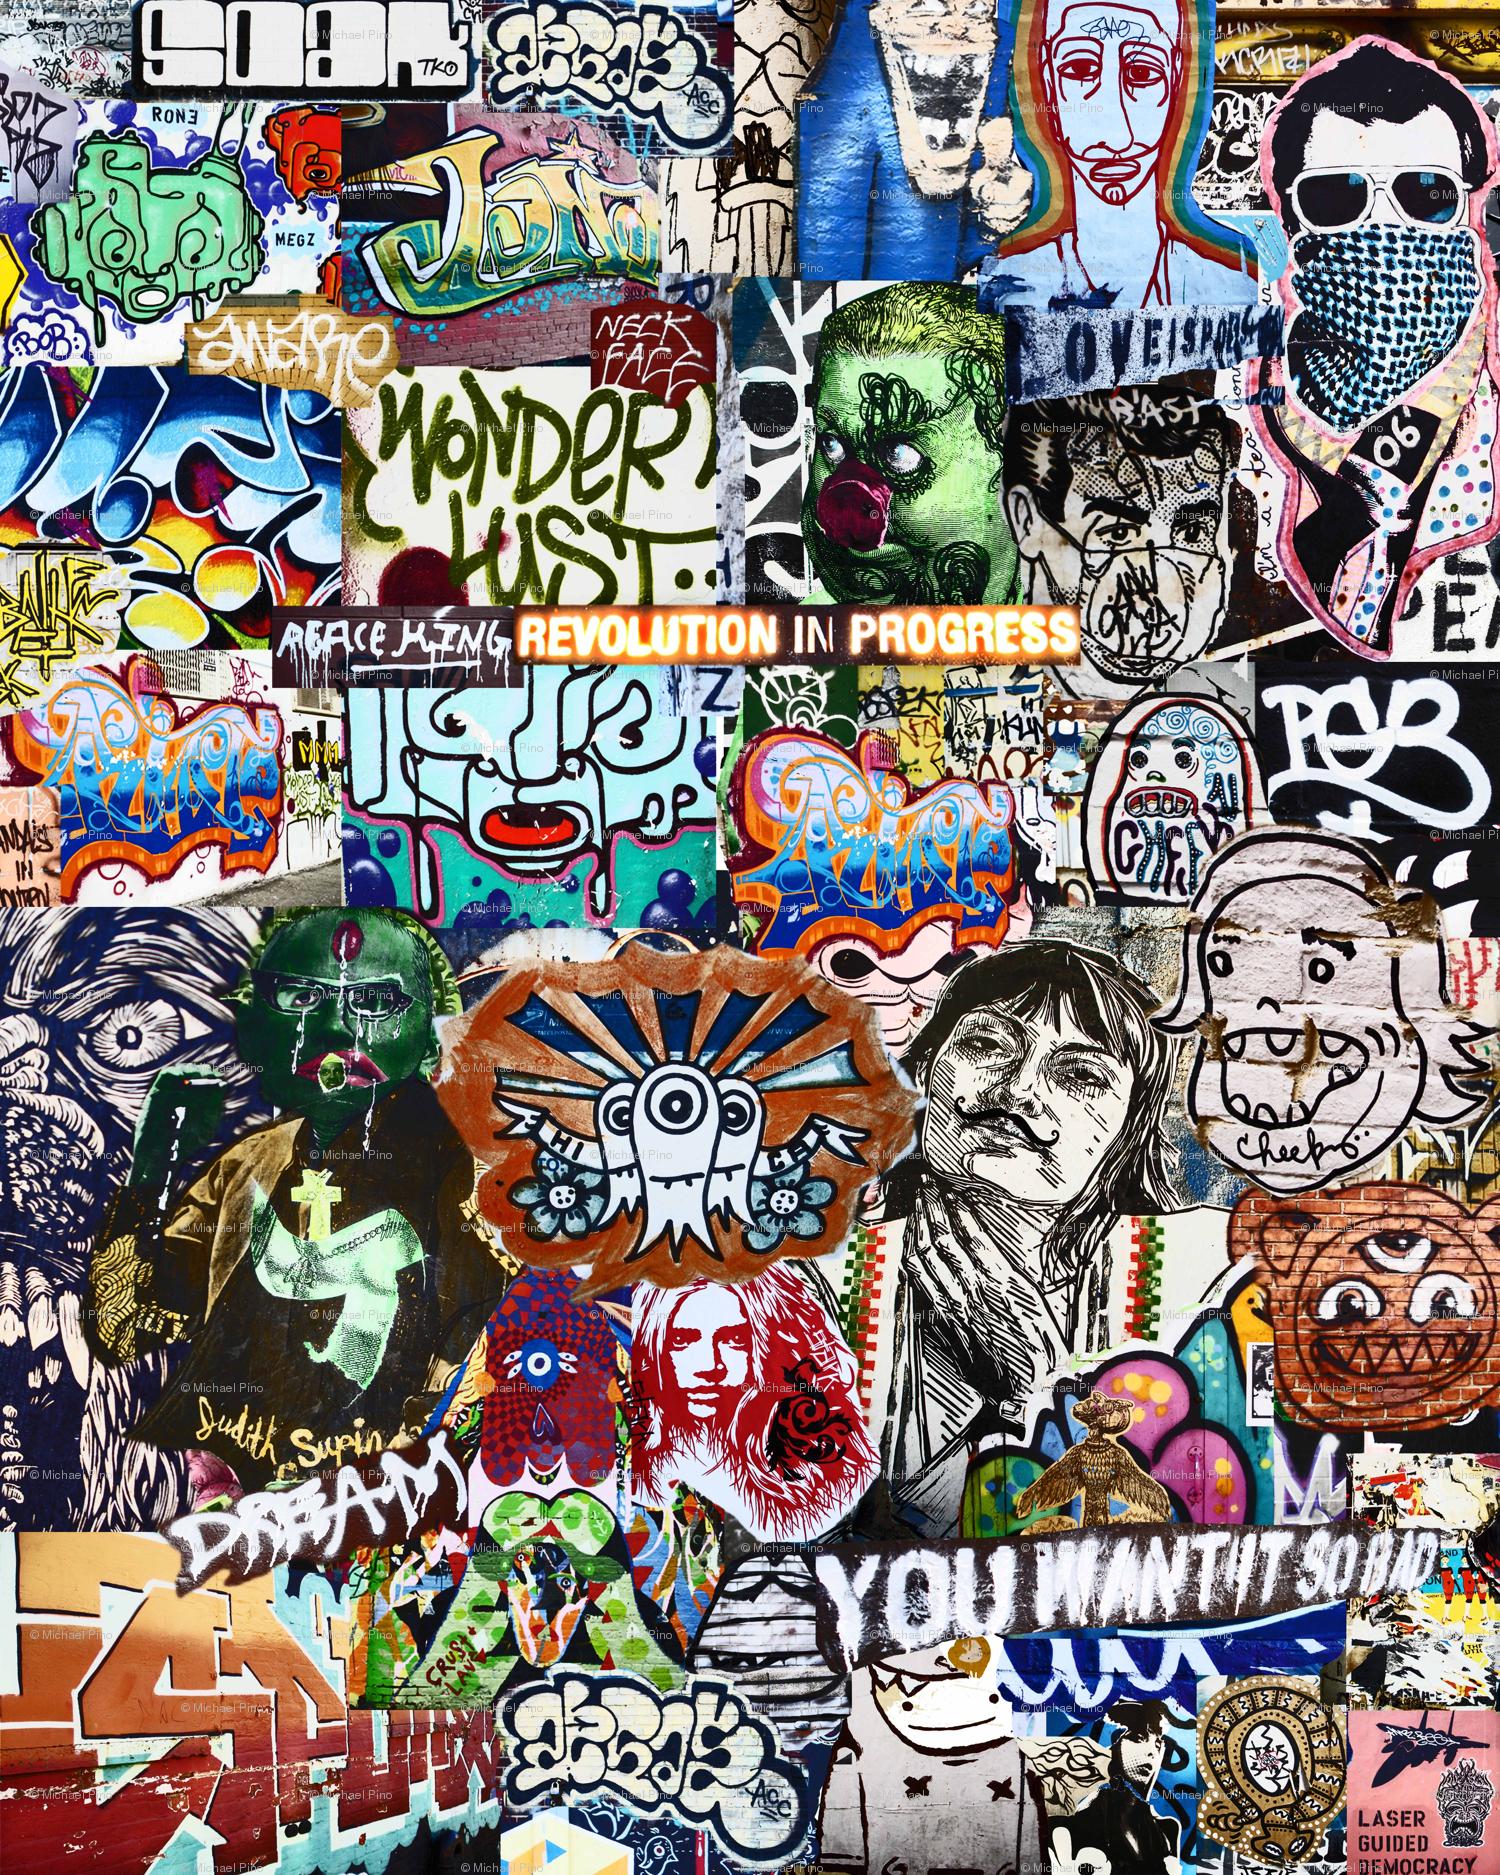 Top Wallpaper Marble Collage - rrrrrGraffiti220_highres  Snapshot_87089.png